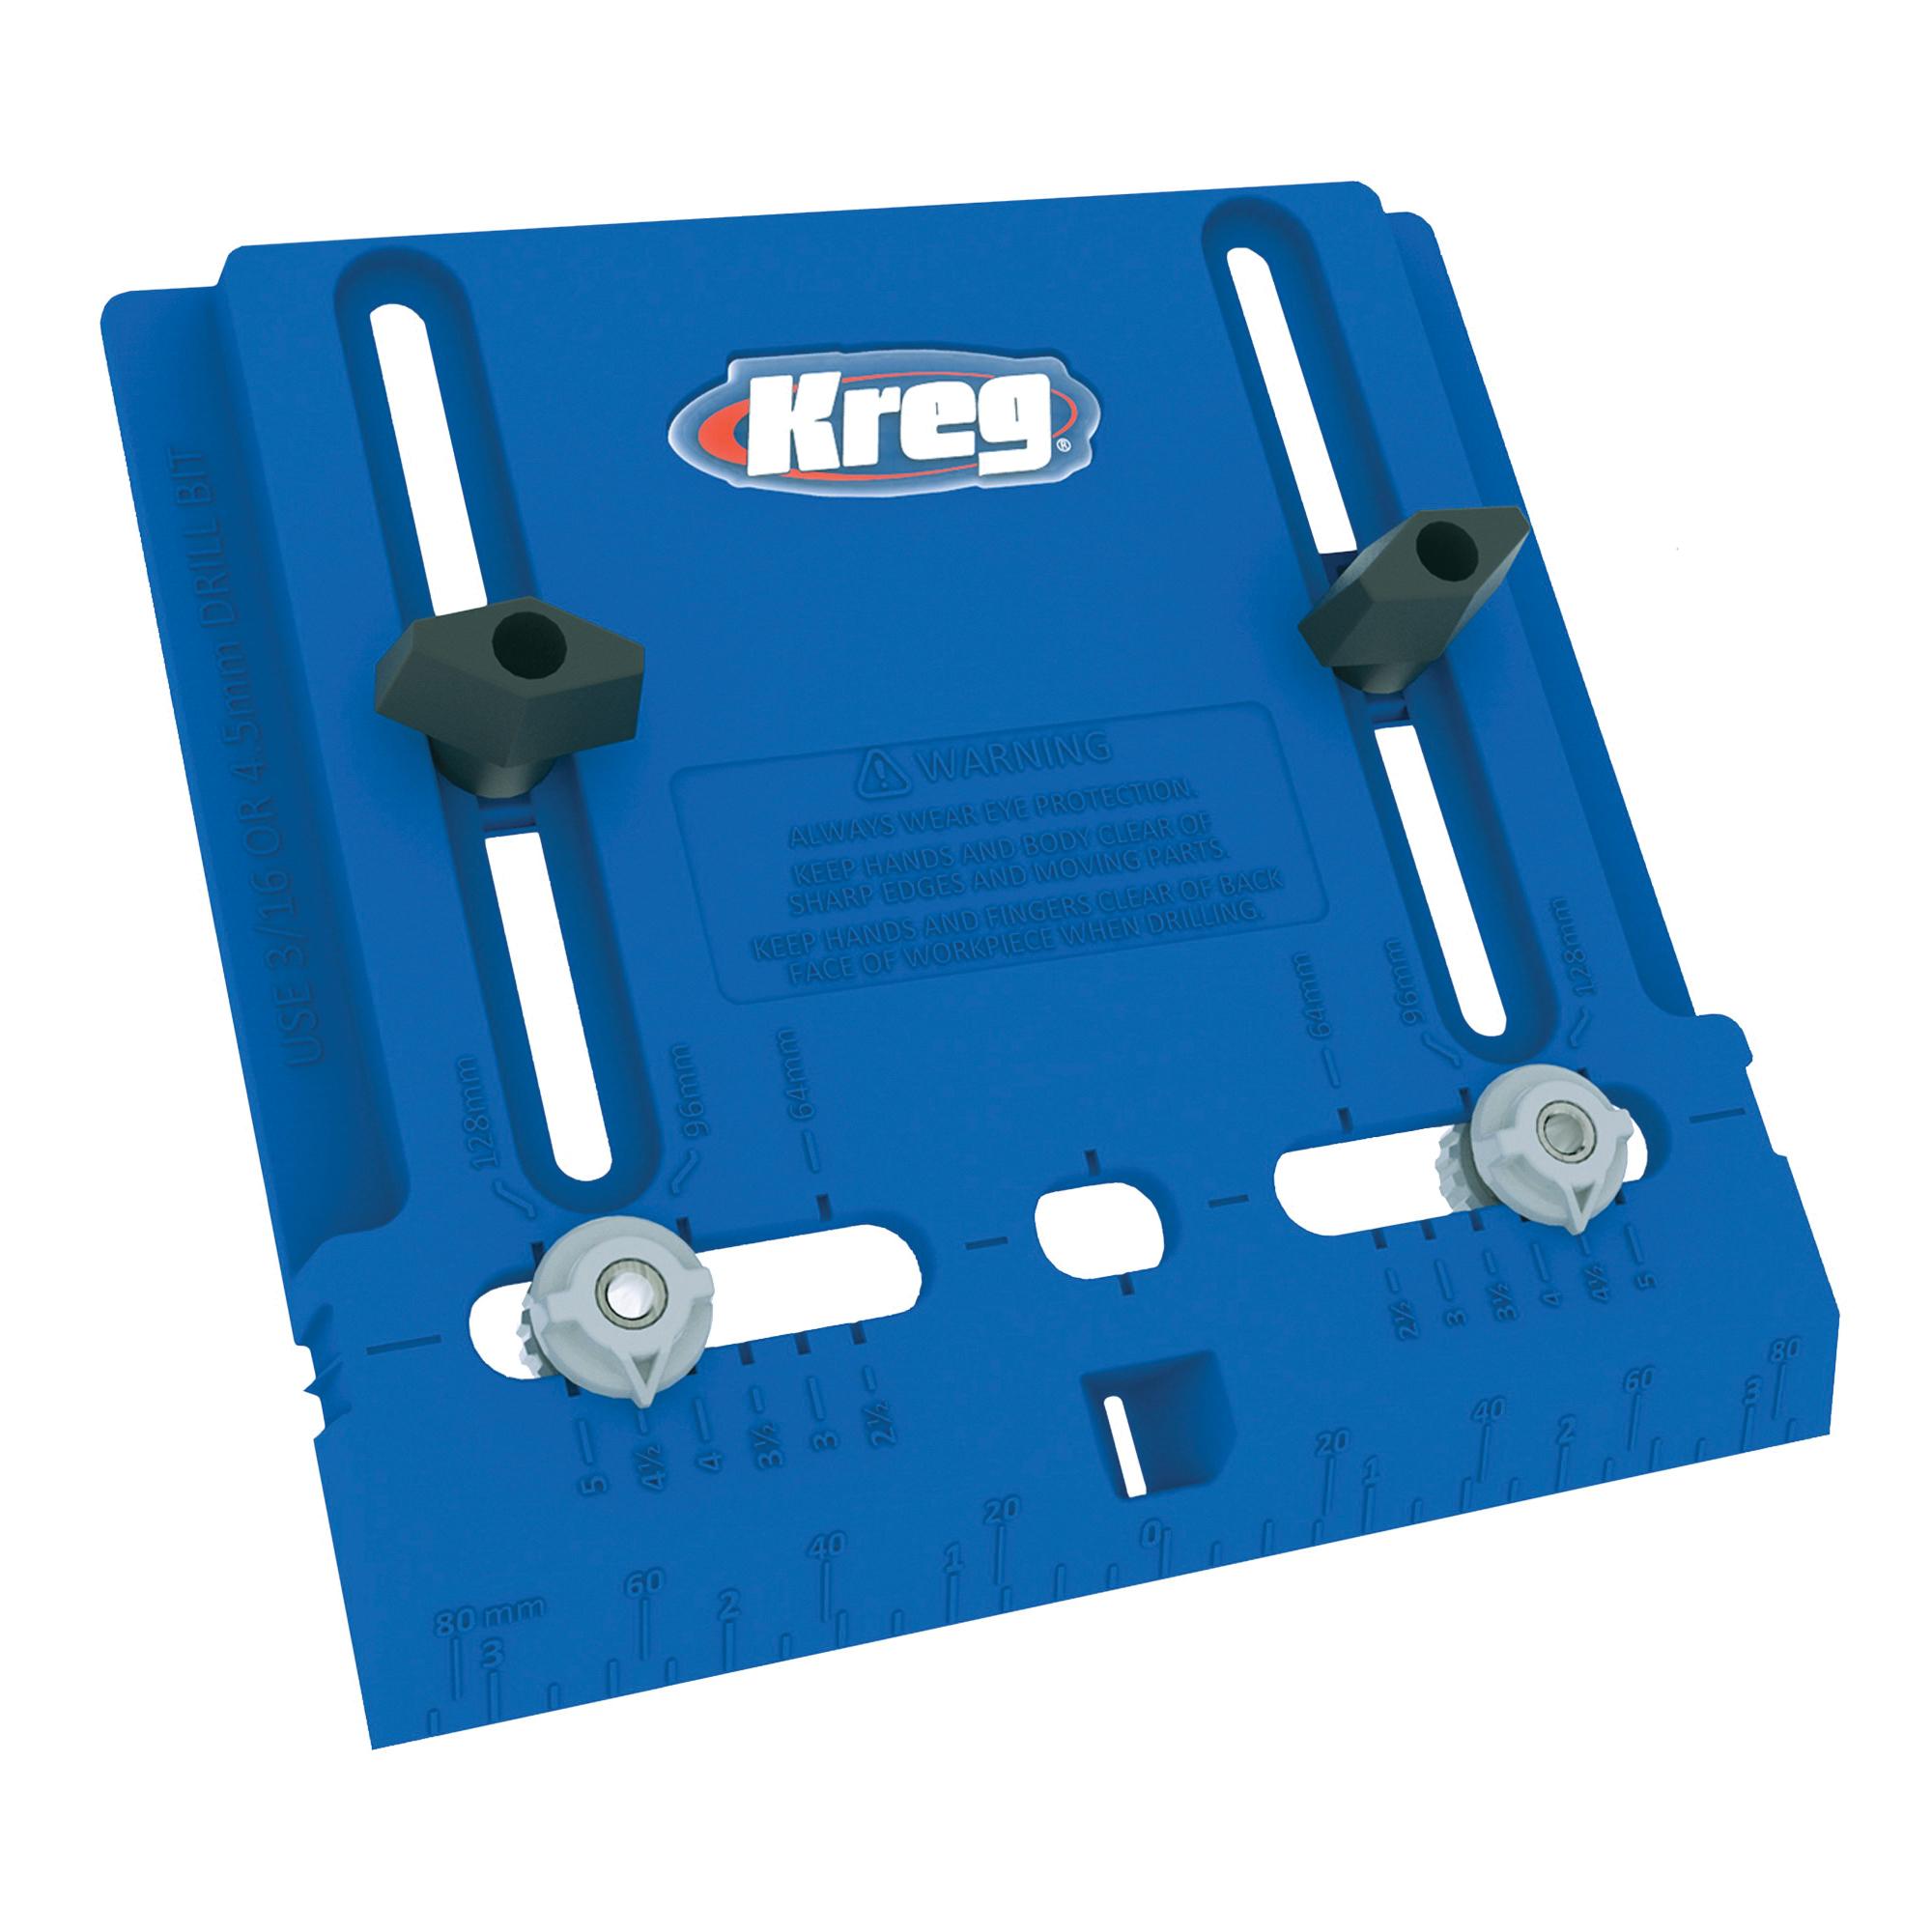 Picture of Kreg KHI-PULL Cabinet Hardware Jig, Polymer